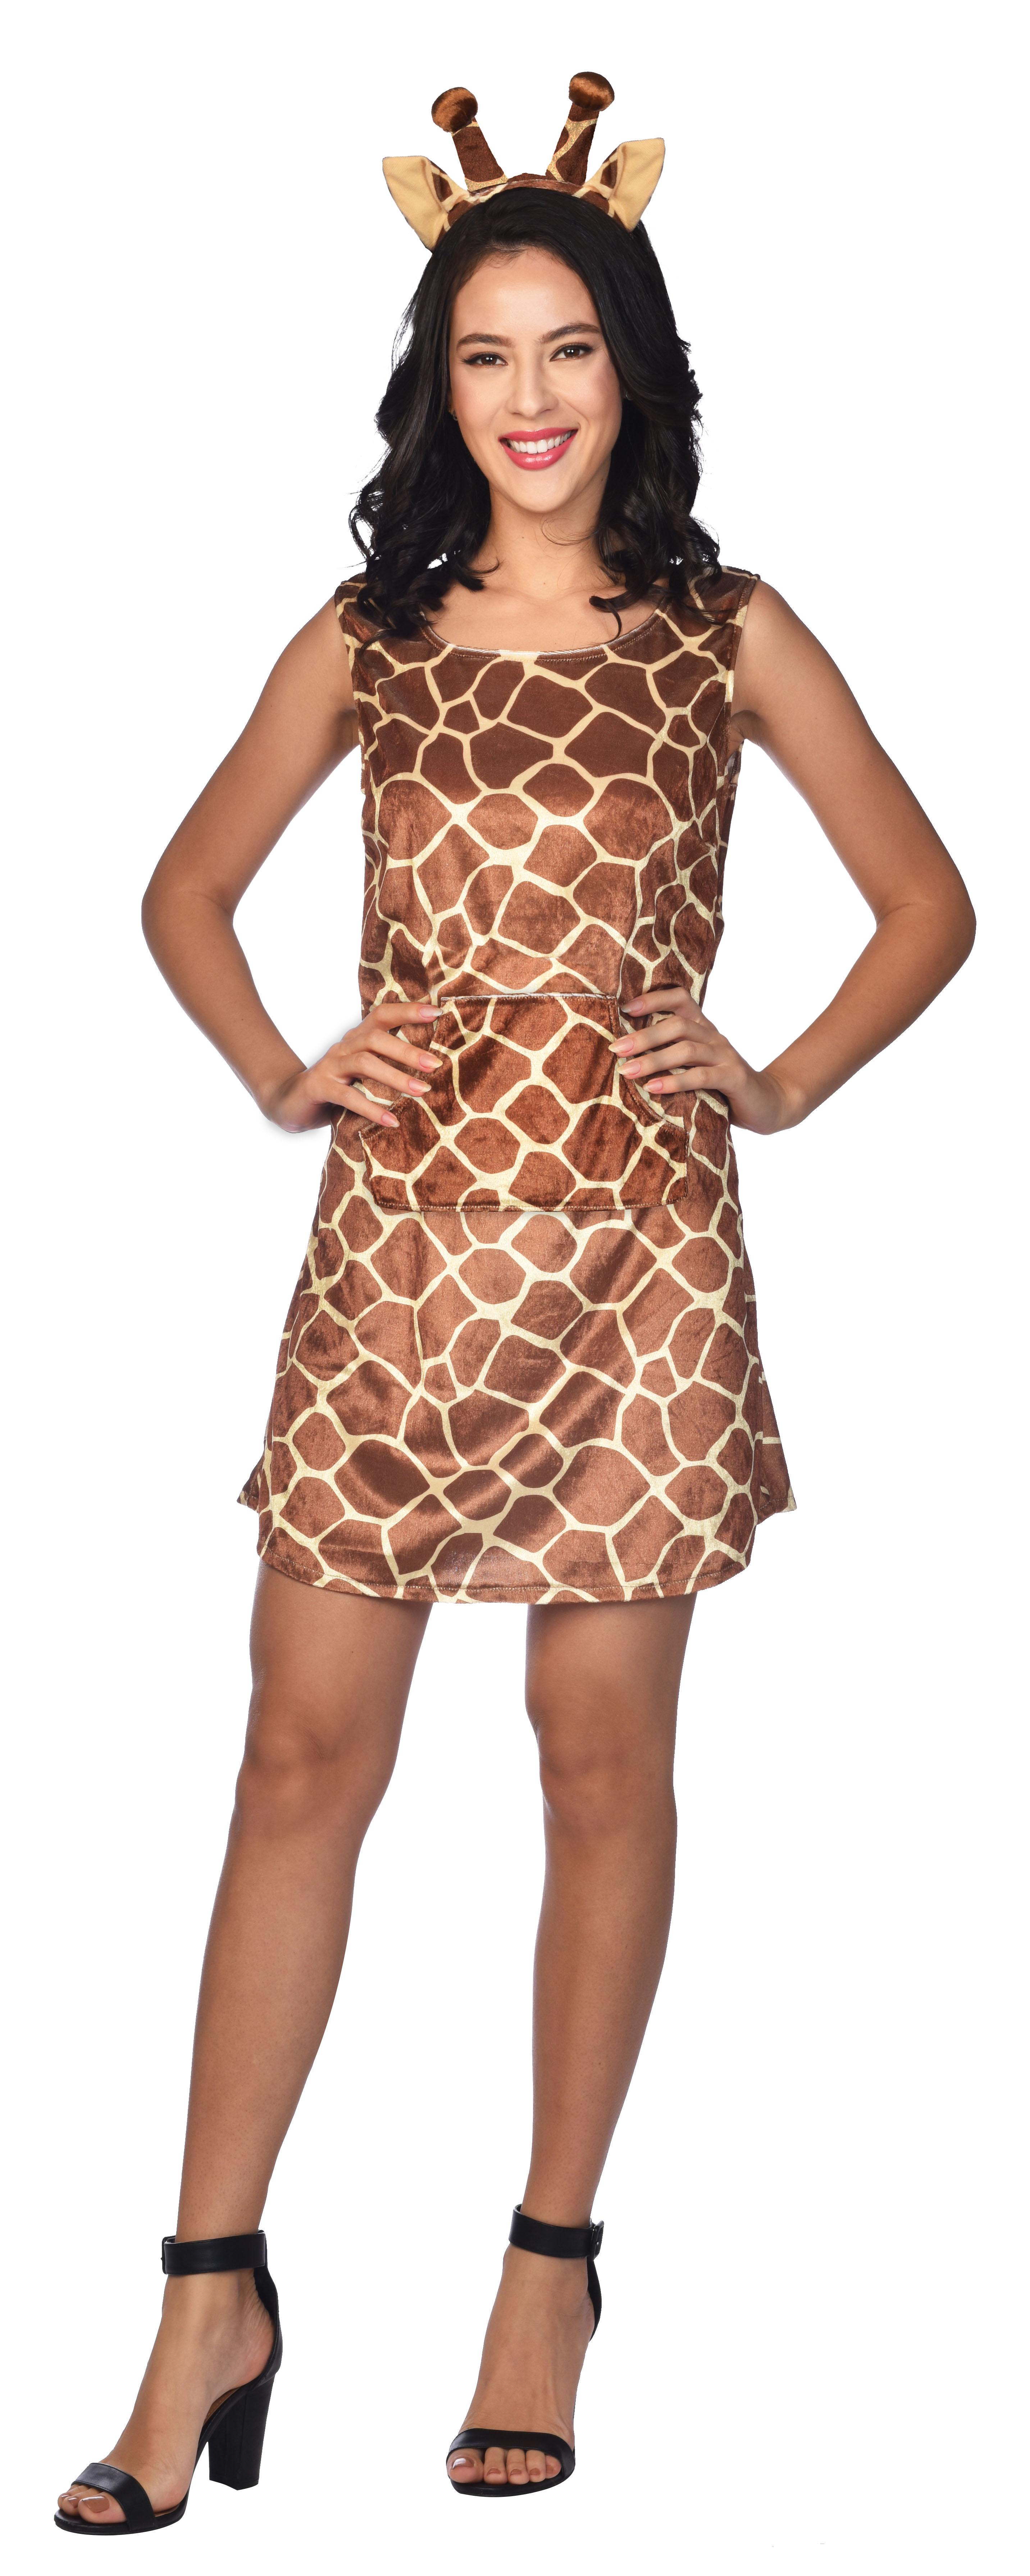 Indexbild 8 - Adult Ladies Zoo Safari Animal Giraffe Lady Fancy Dress Costume Womens Outfit